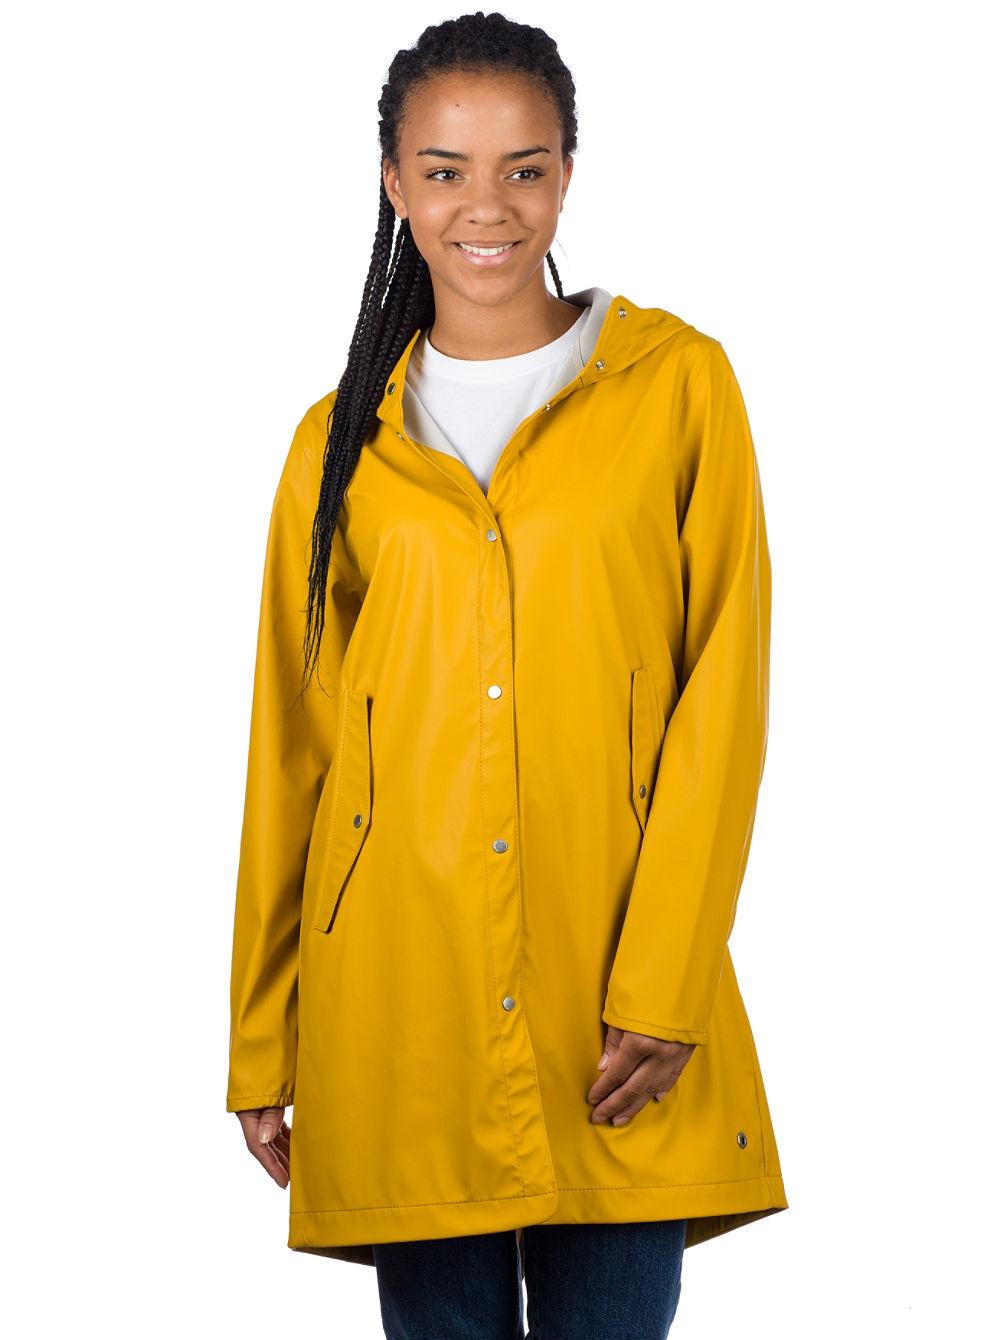 6c004822e2e Herschel Rainwear Fishtail Jas online kopen bij Blue Tomato